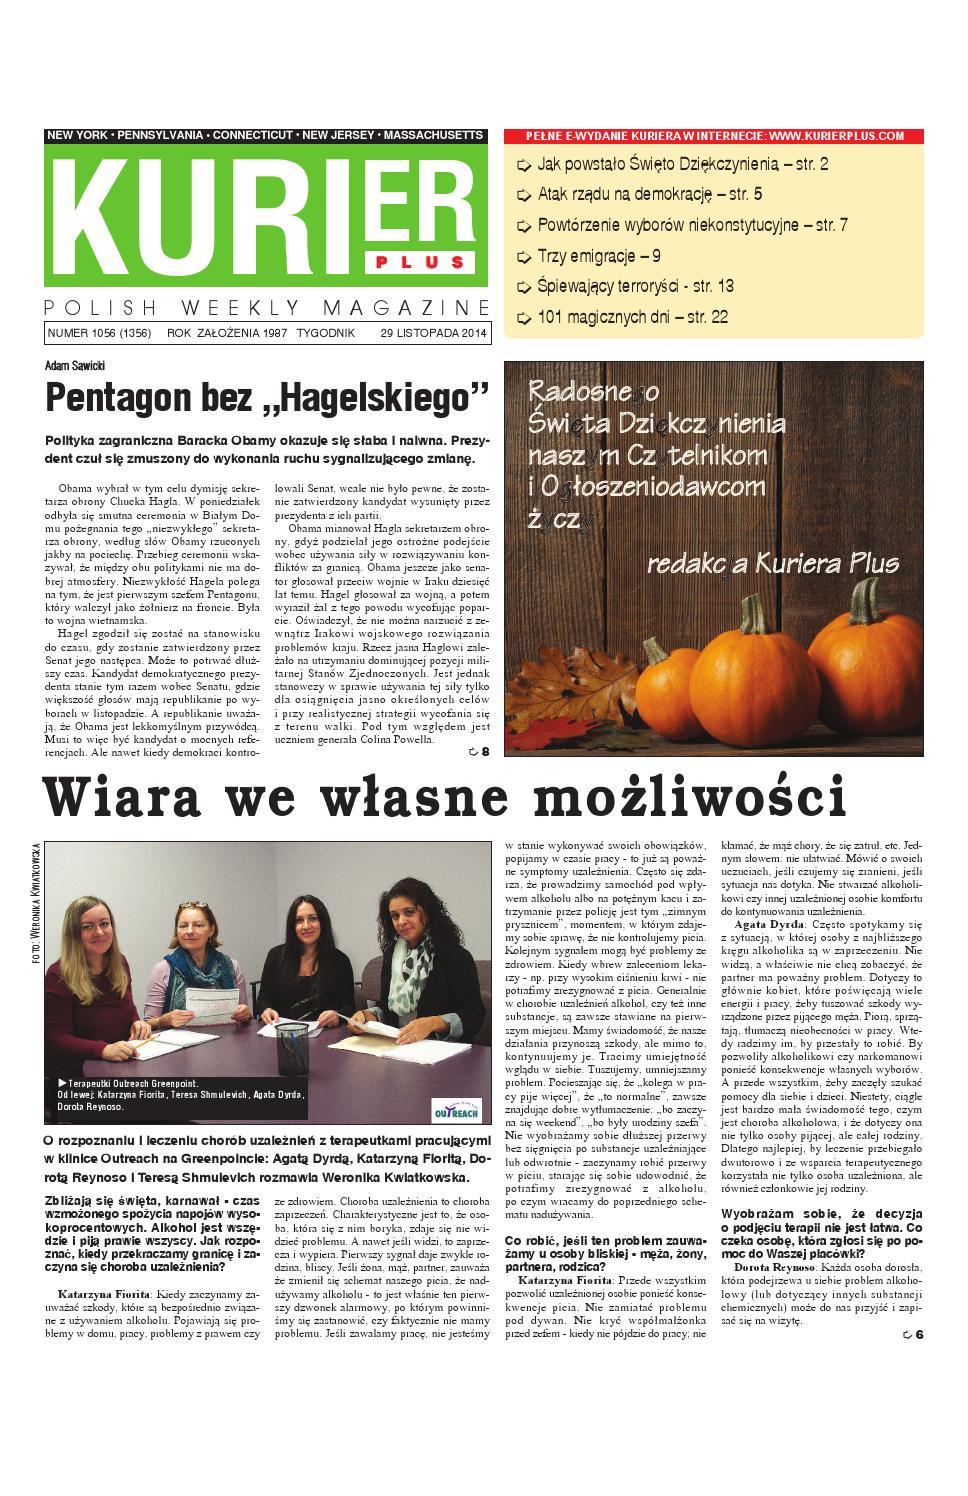 Kurier Plus 29 Listopada 2014 By Kurier Plus Issuu